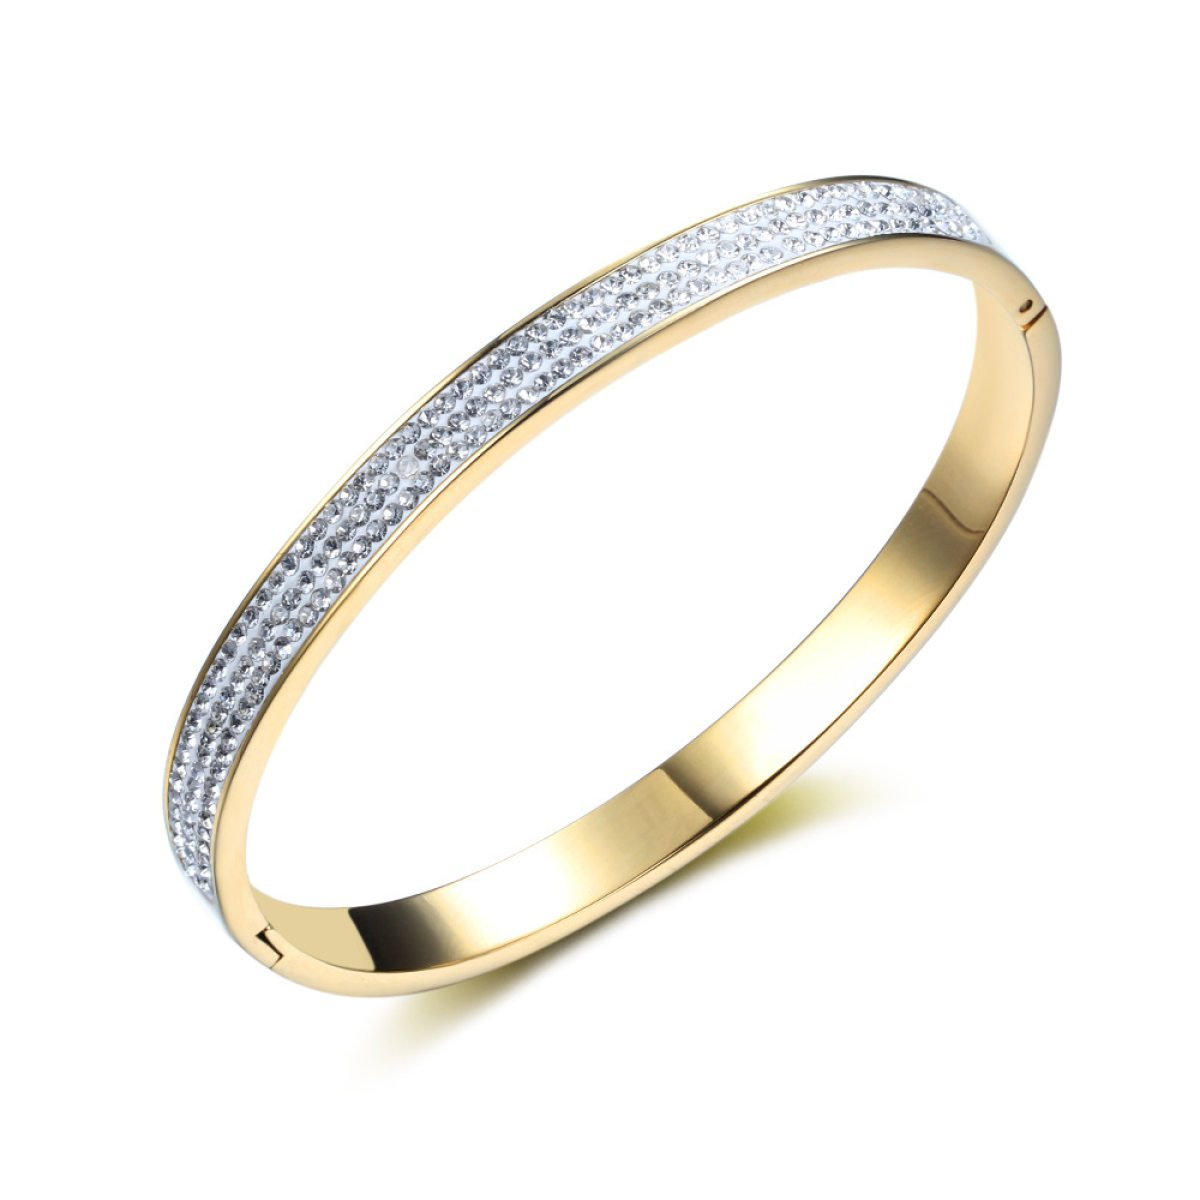 LZHMTitanium Acero Joyería Brazalete De Diamantes De Cerámica Suave